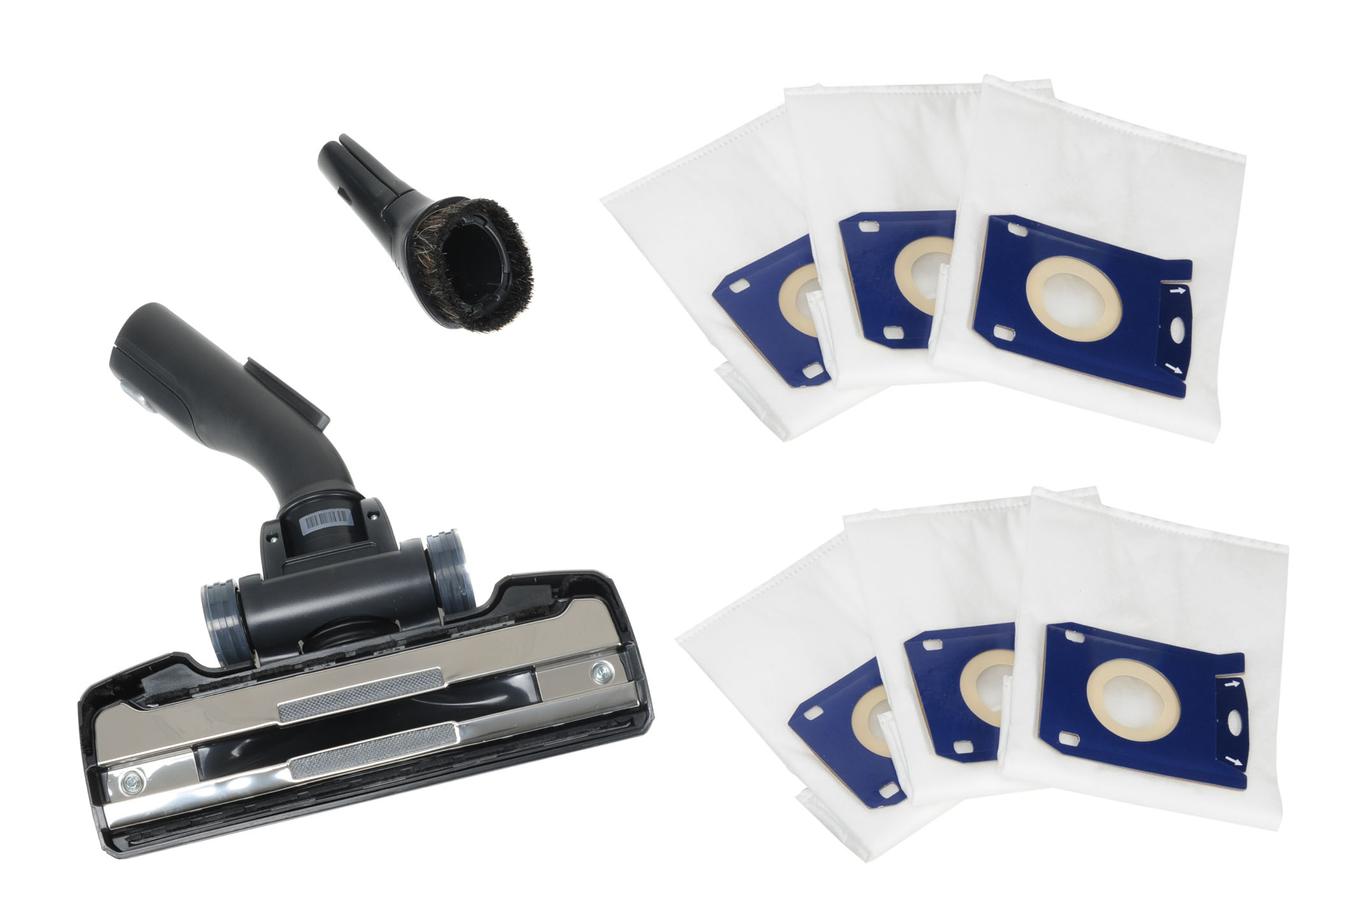 aspirateur avec sac electrolux ultraone mini umorigin ultraone 3656179 darty. Black Bedroom Furniture Sets. Home Design Ideas